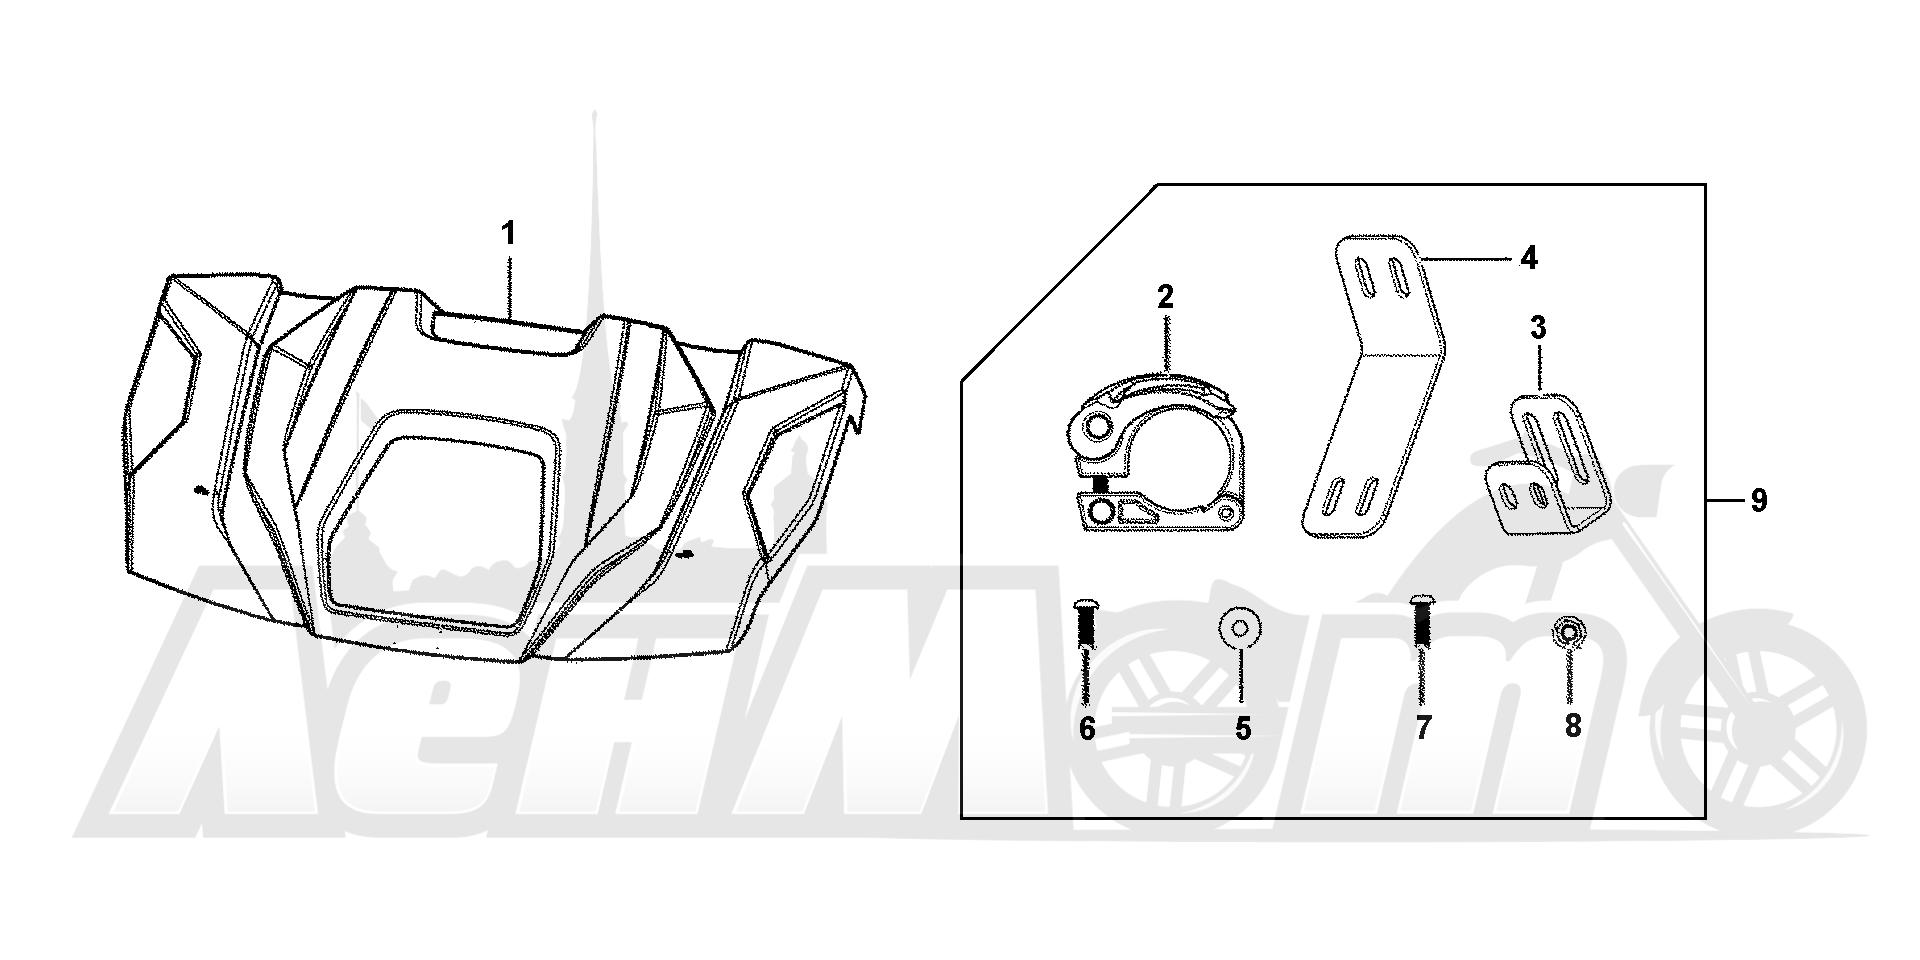 Запчасти для Квадроцикла Honda 2019 SXS1000M3P Раздел: HARD ROOF (3P) | HARD крыша (3P)